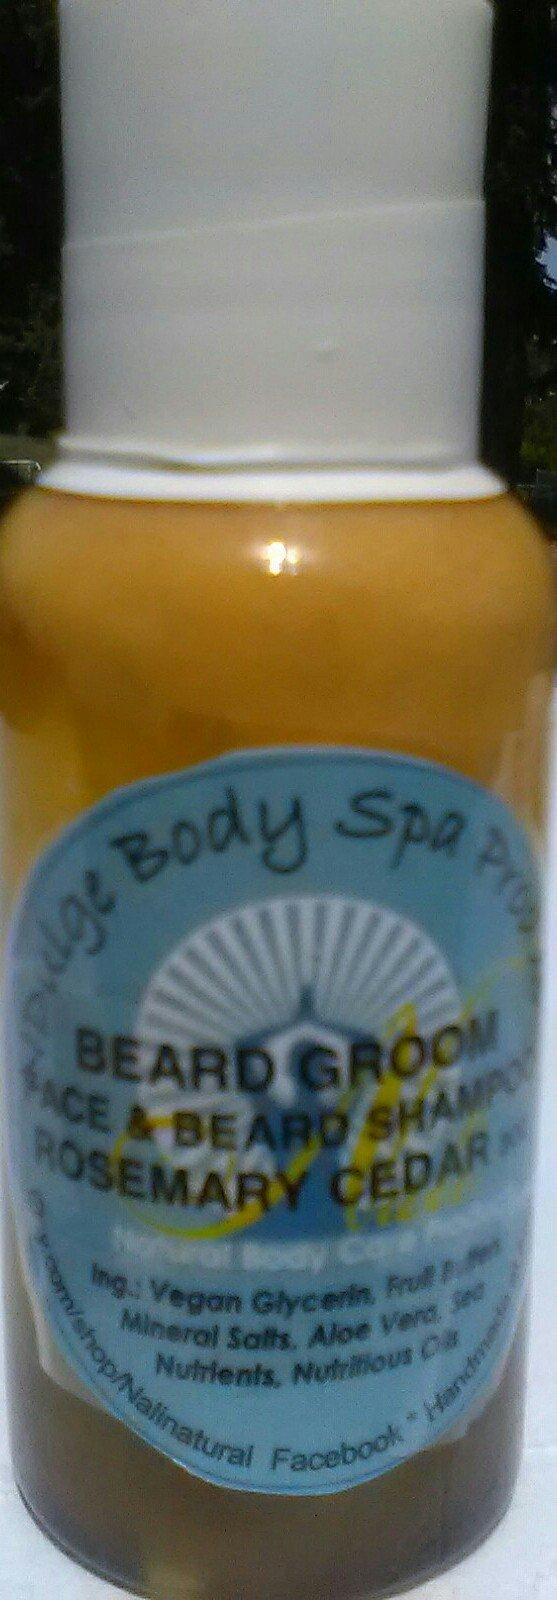 BEARD GROOM - Beard Shampoo with Superfruit Mangosteen